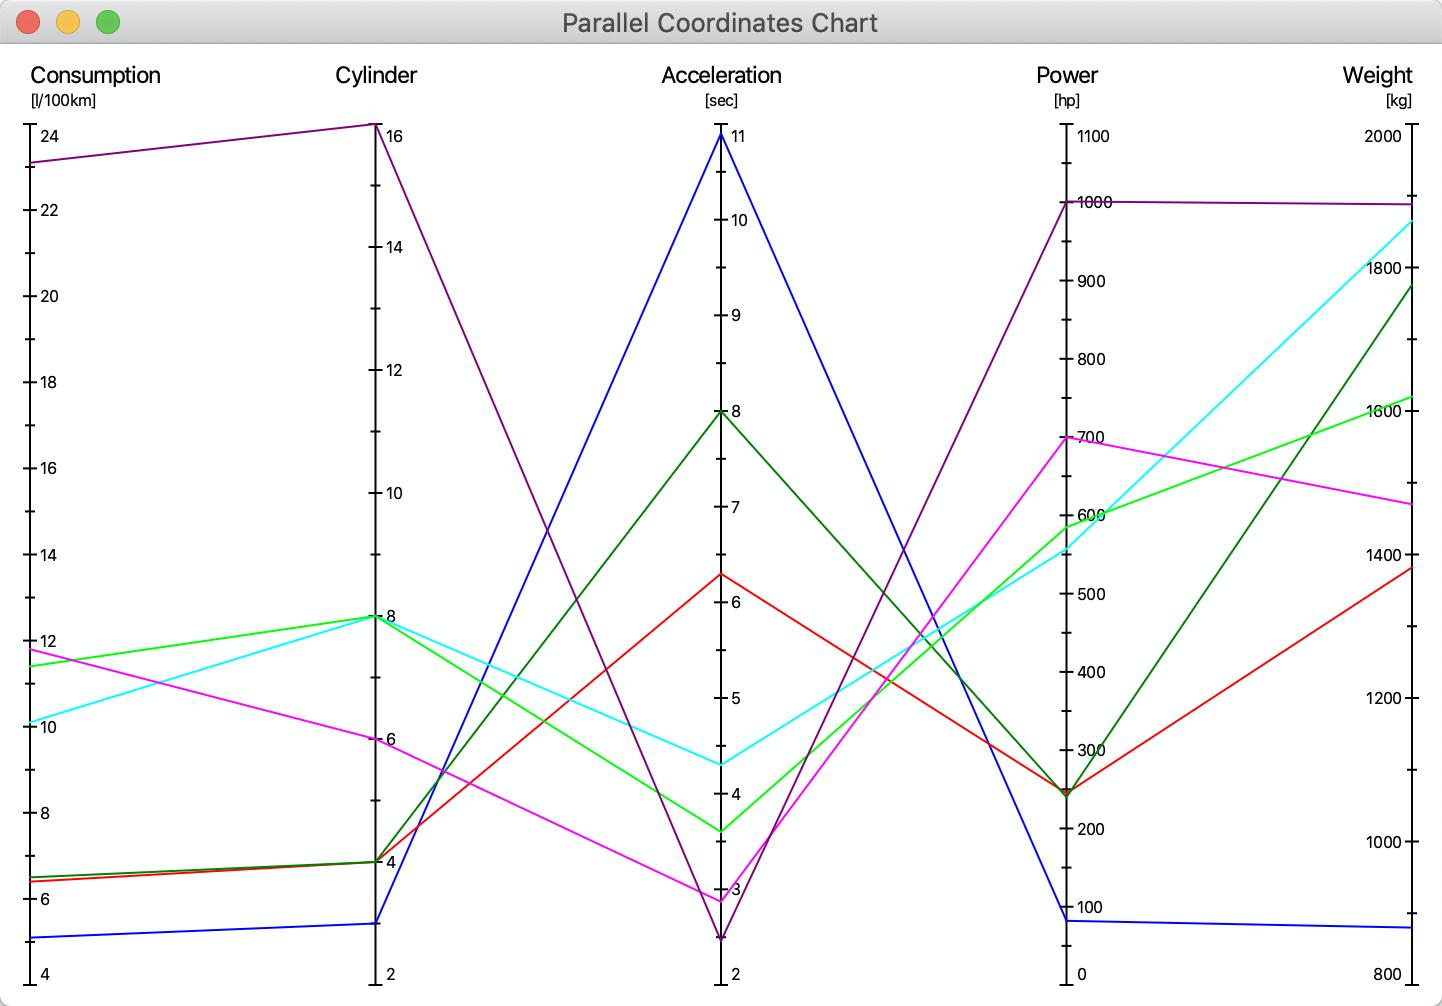 Parallel coordinates chart